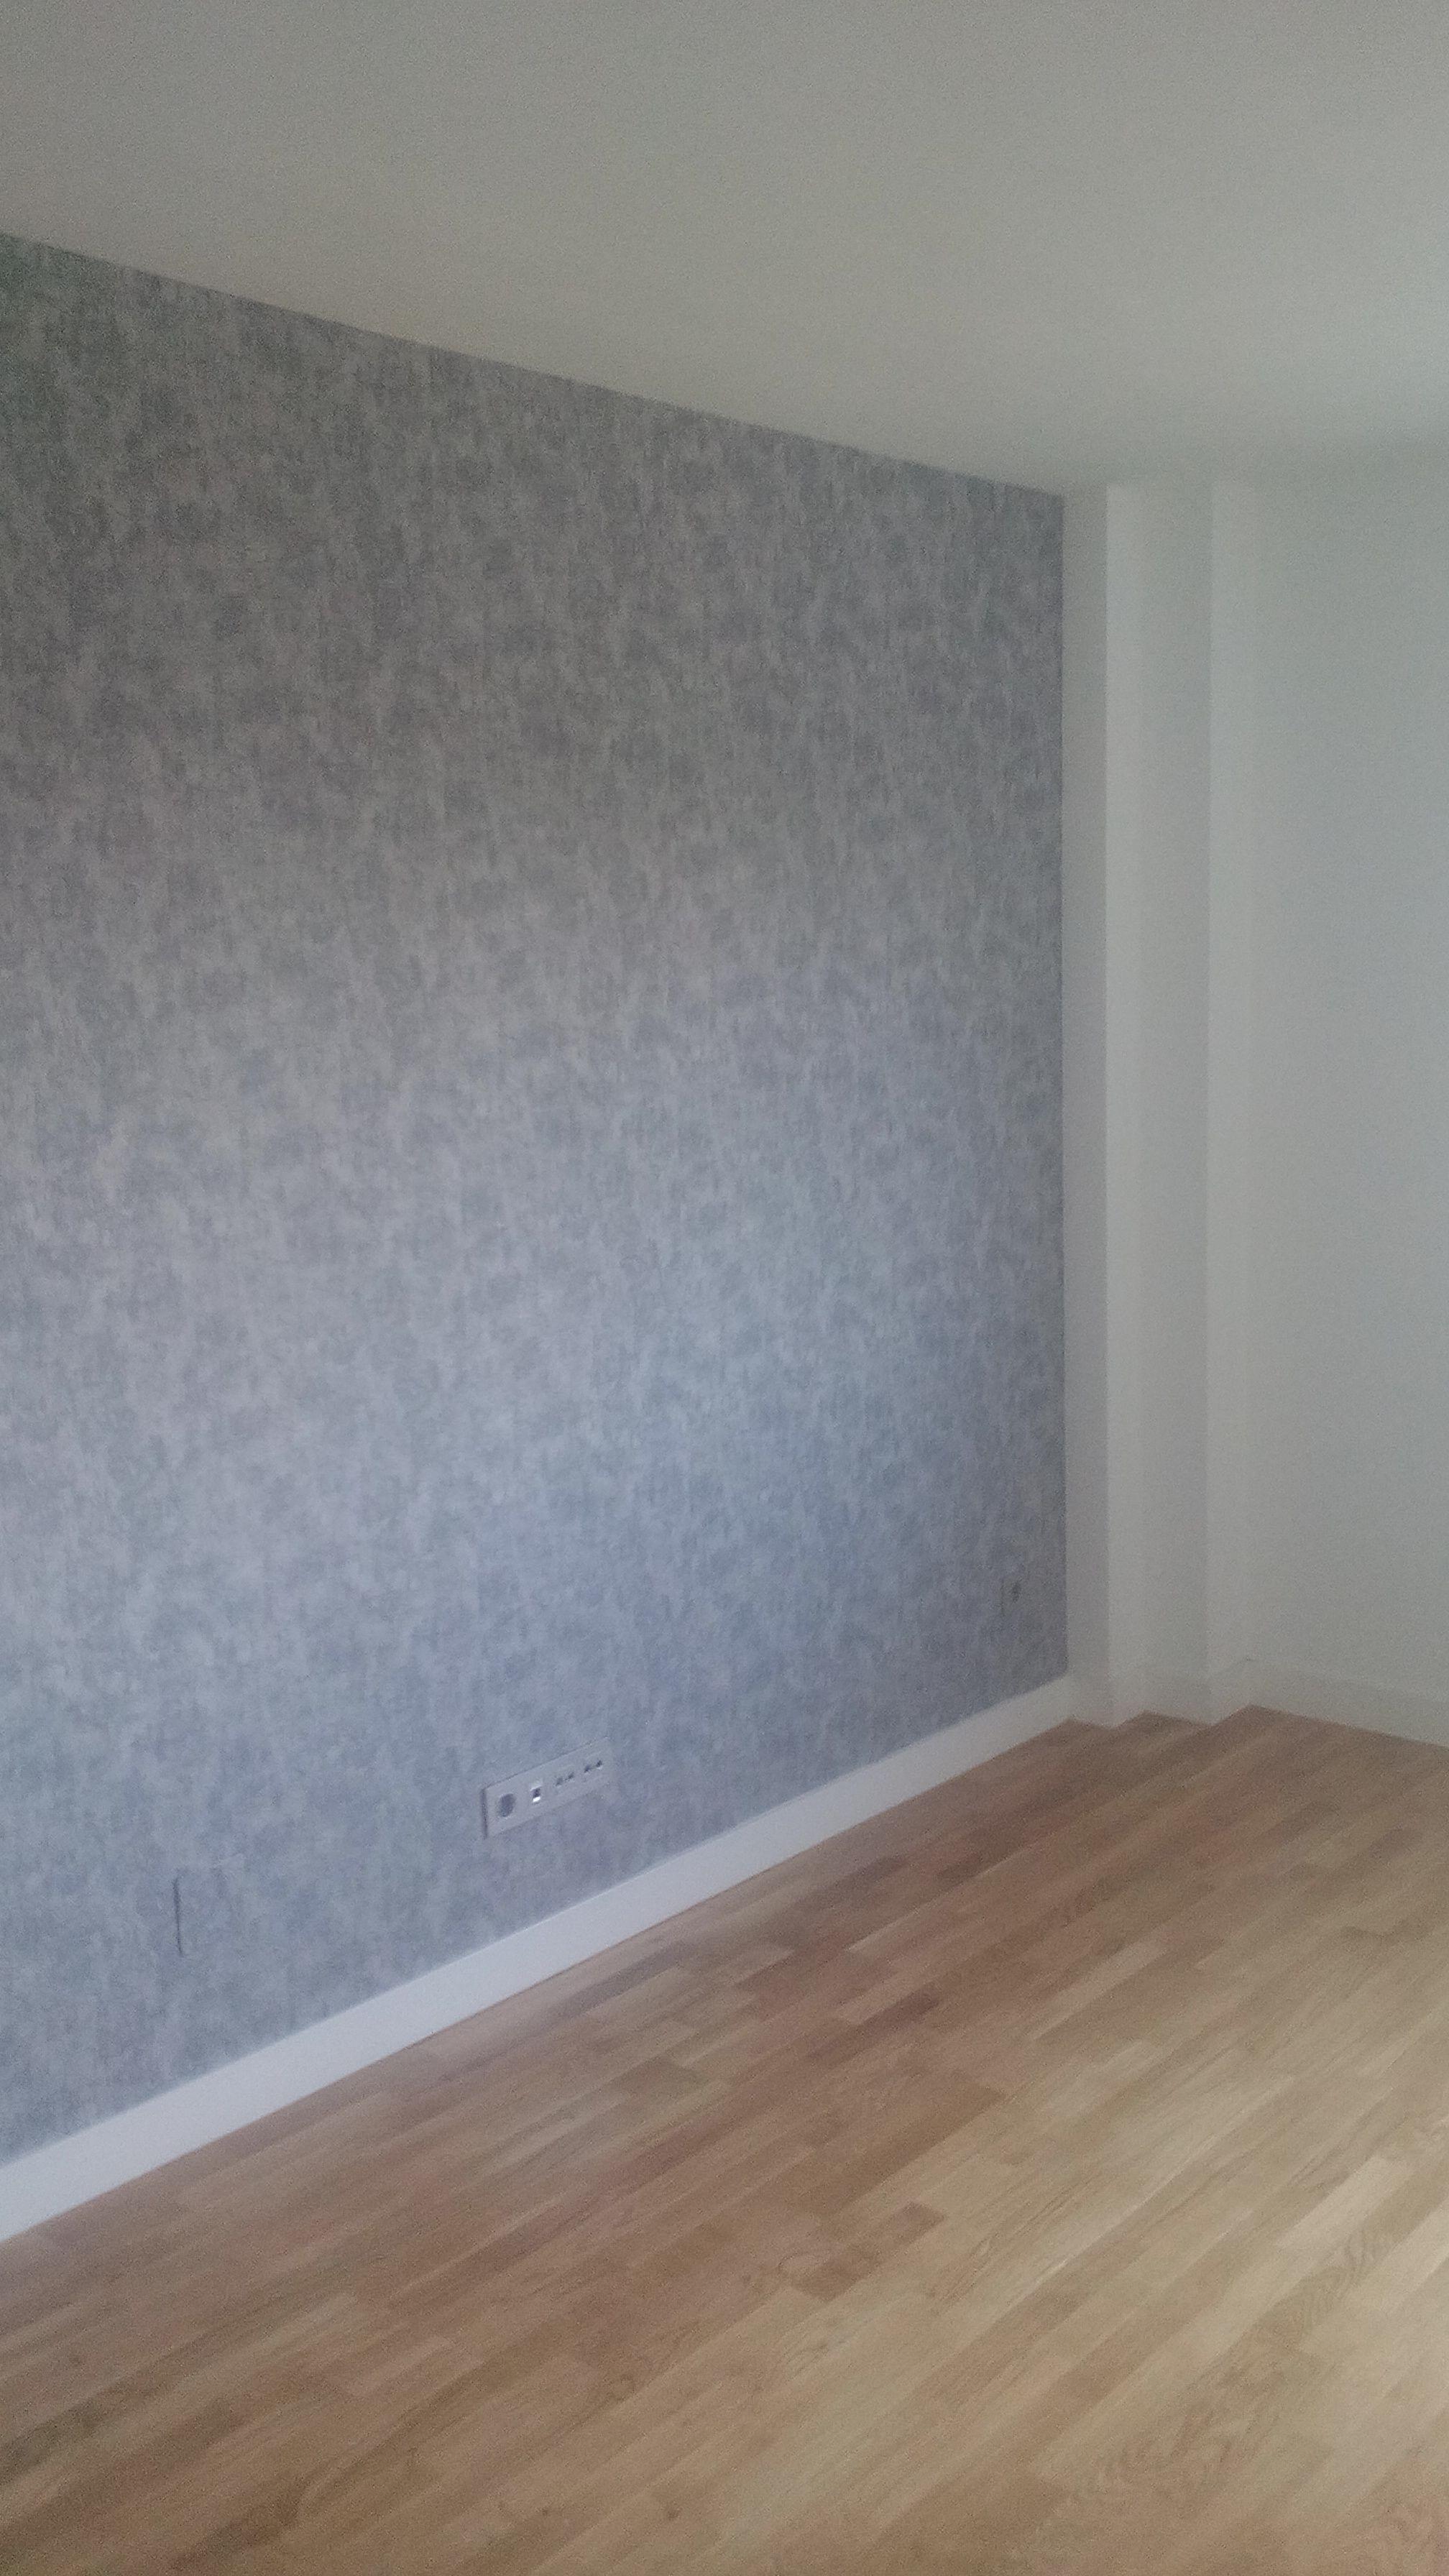 Papel pared gris papel pintado efecto estuco gris marengo estilo rstico papel pintado fondo for Papel pintado piedra gris